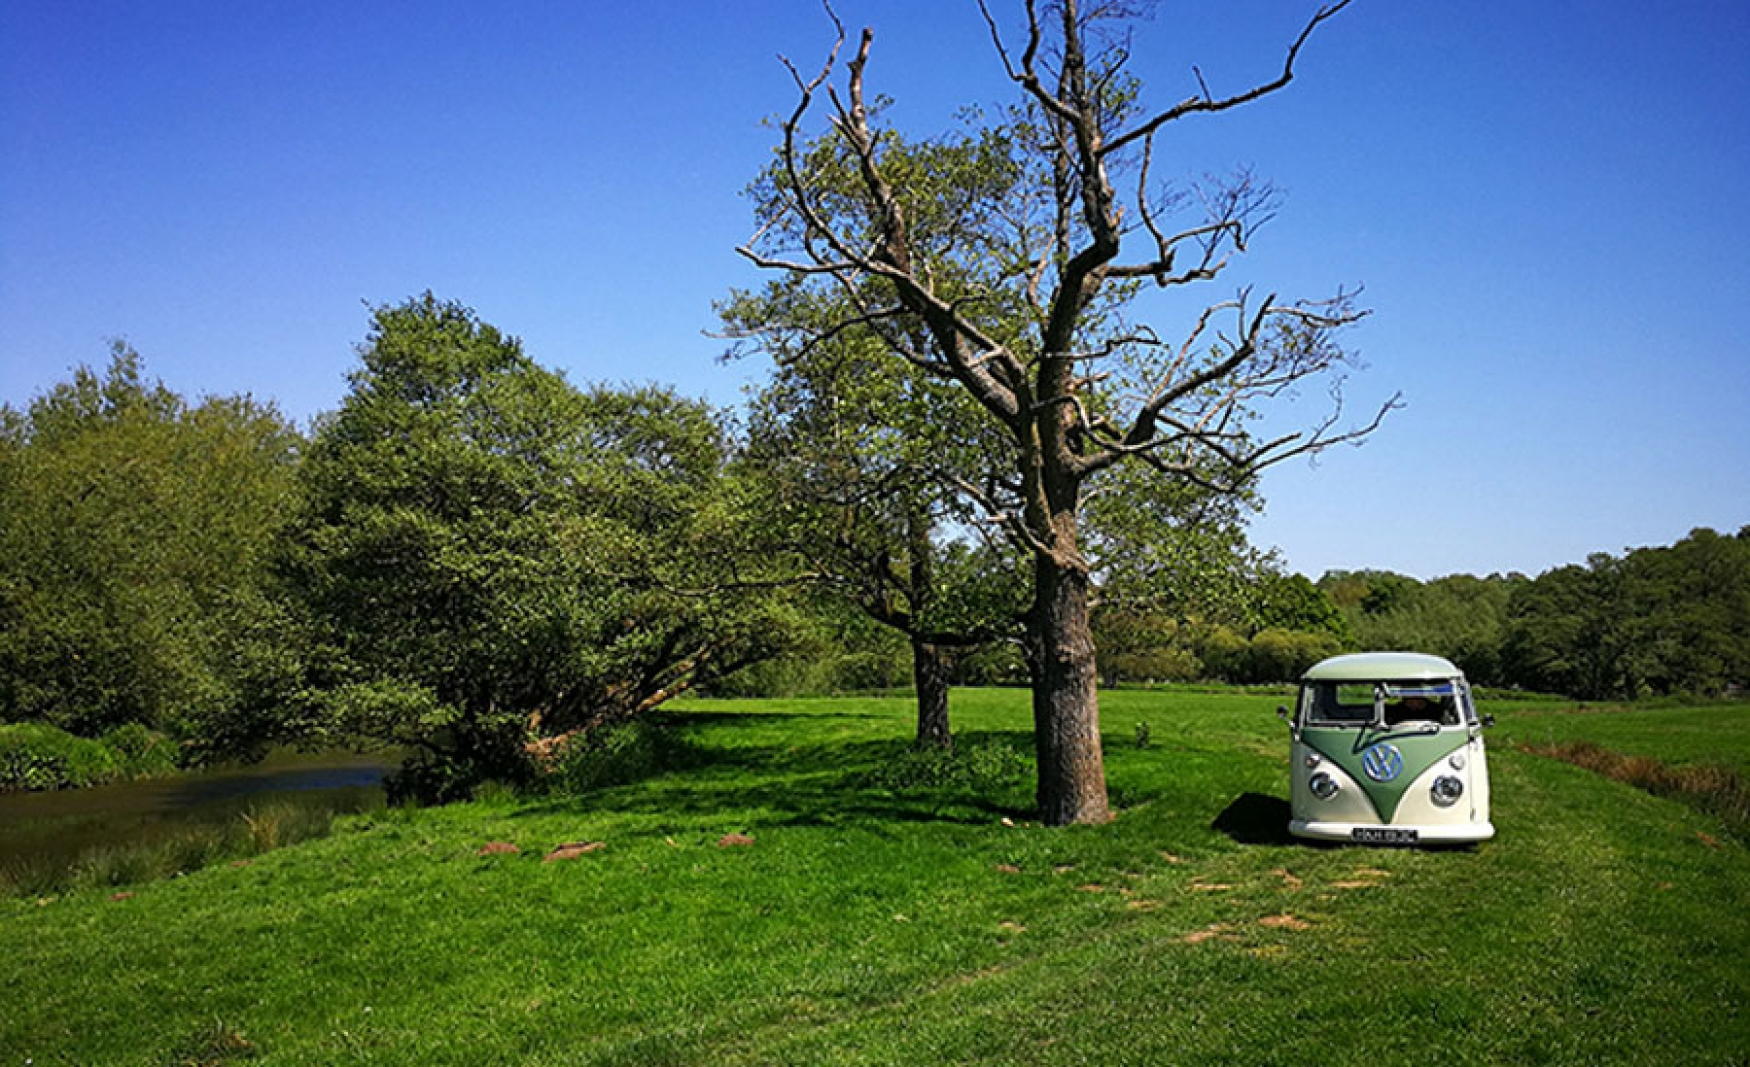 fiesta-fields-outdoor-wedding-events-company-tipi-surrey-sussex-eashing-farm-godalming-6